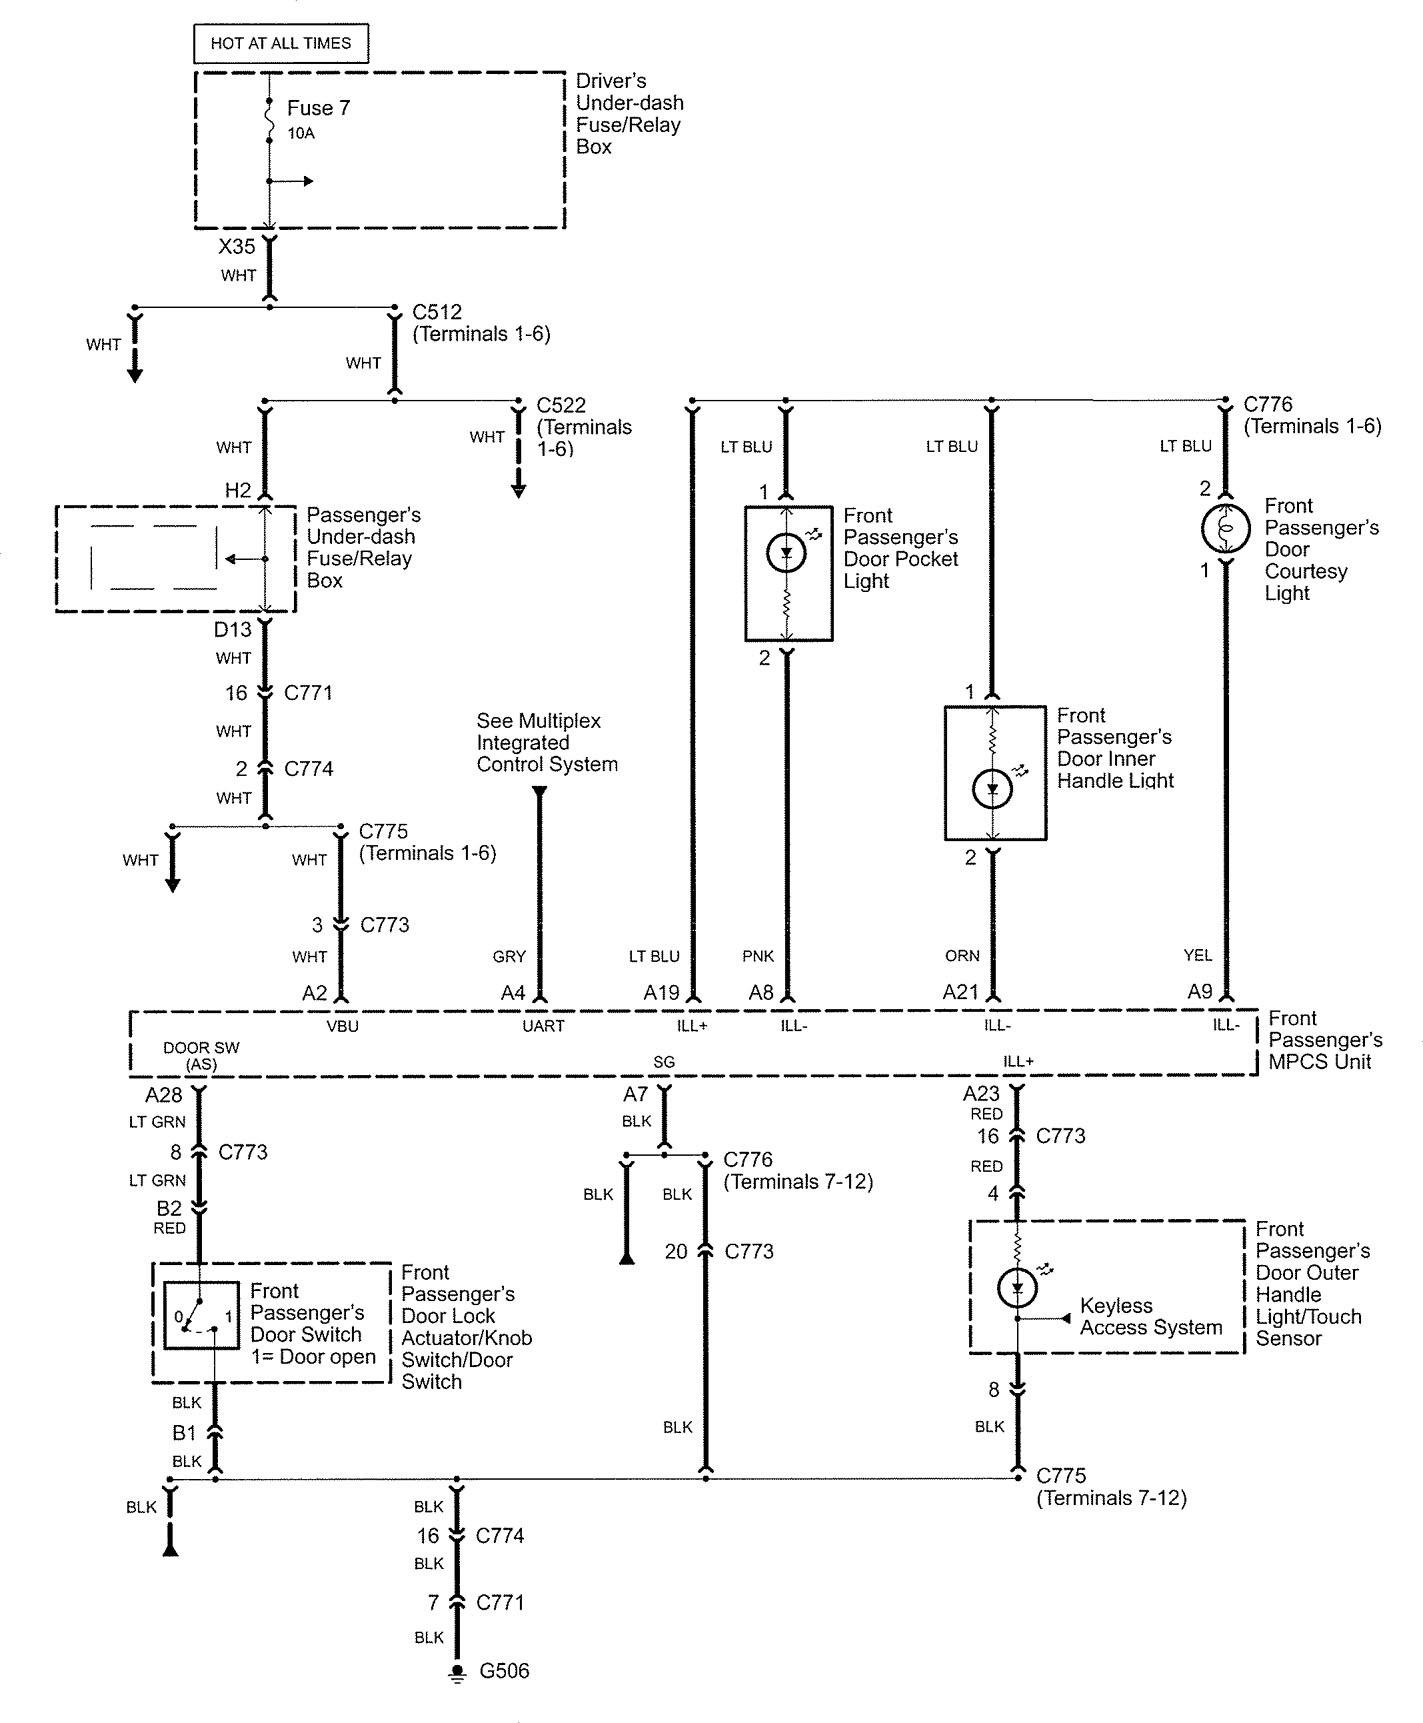 exelent dell studio wiring diagram image collection electrical rh piotomar info 2000 VW Wiring Diagram Computer Desktop Wiring-Diagram